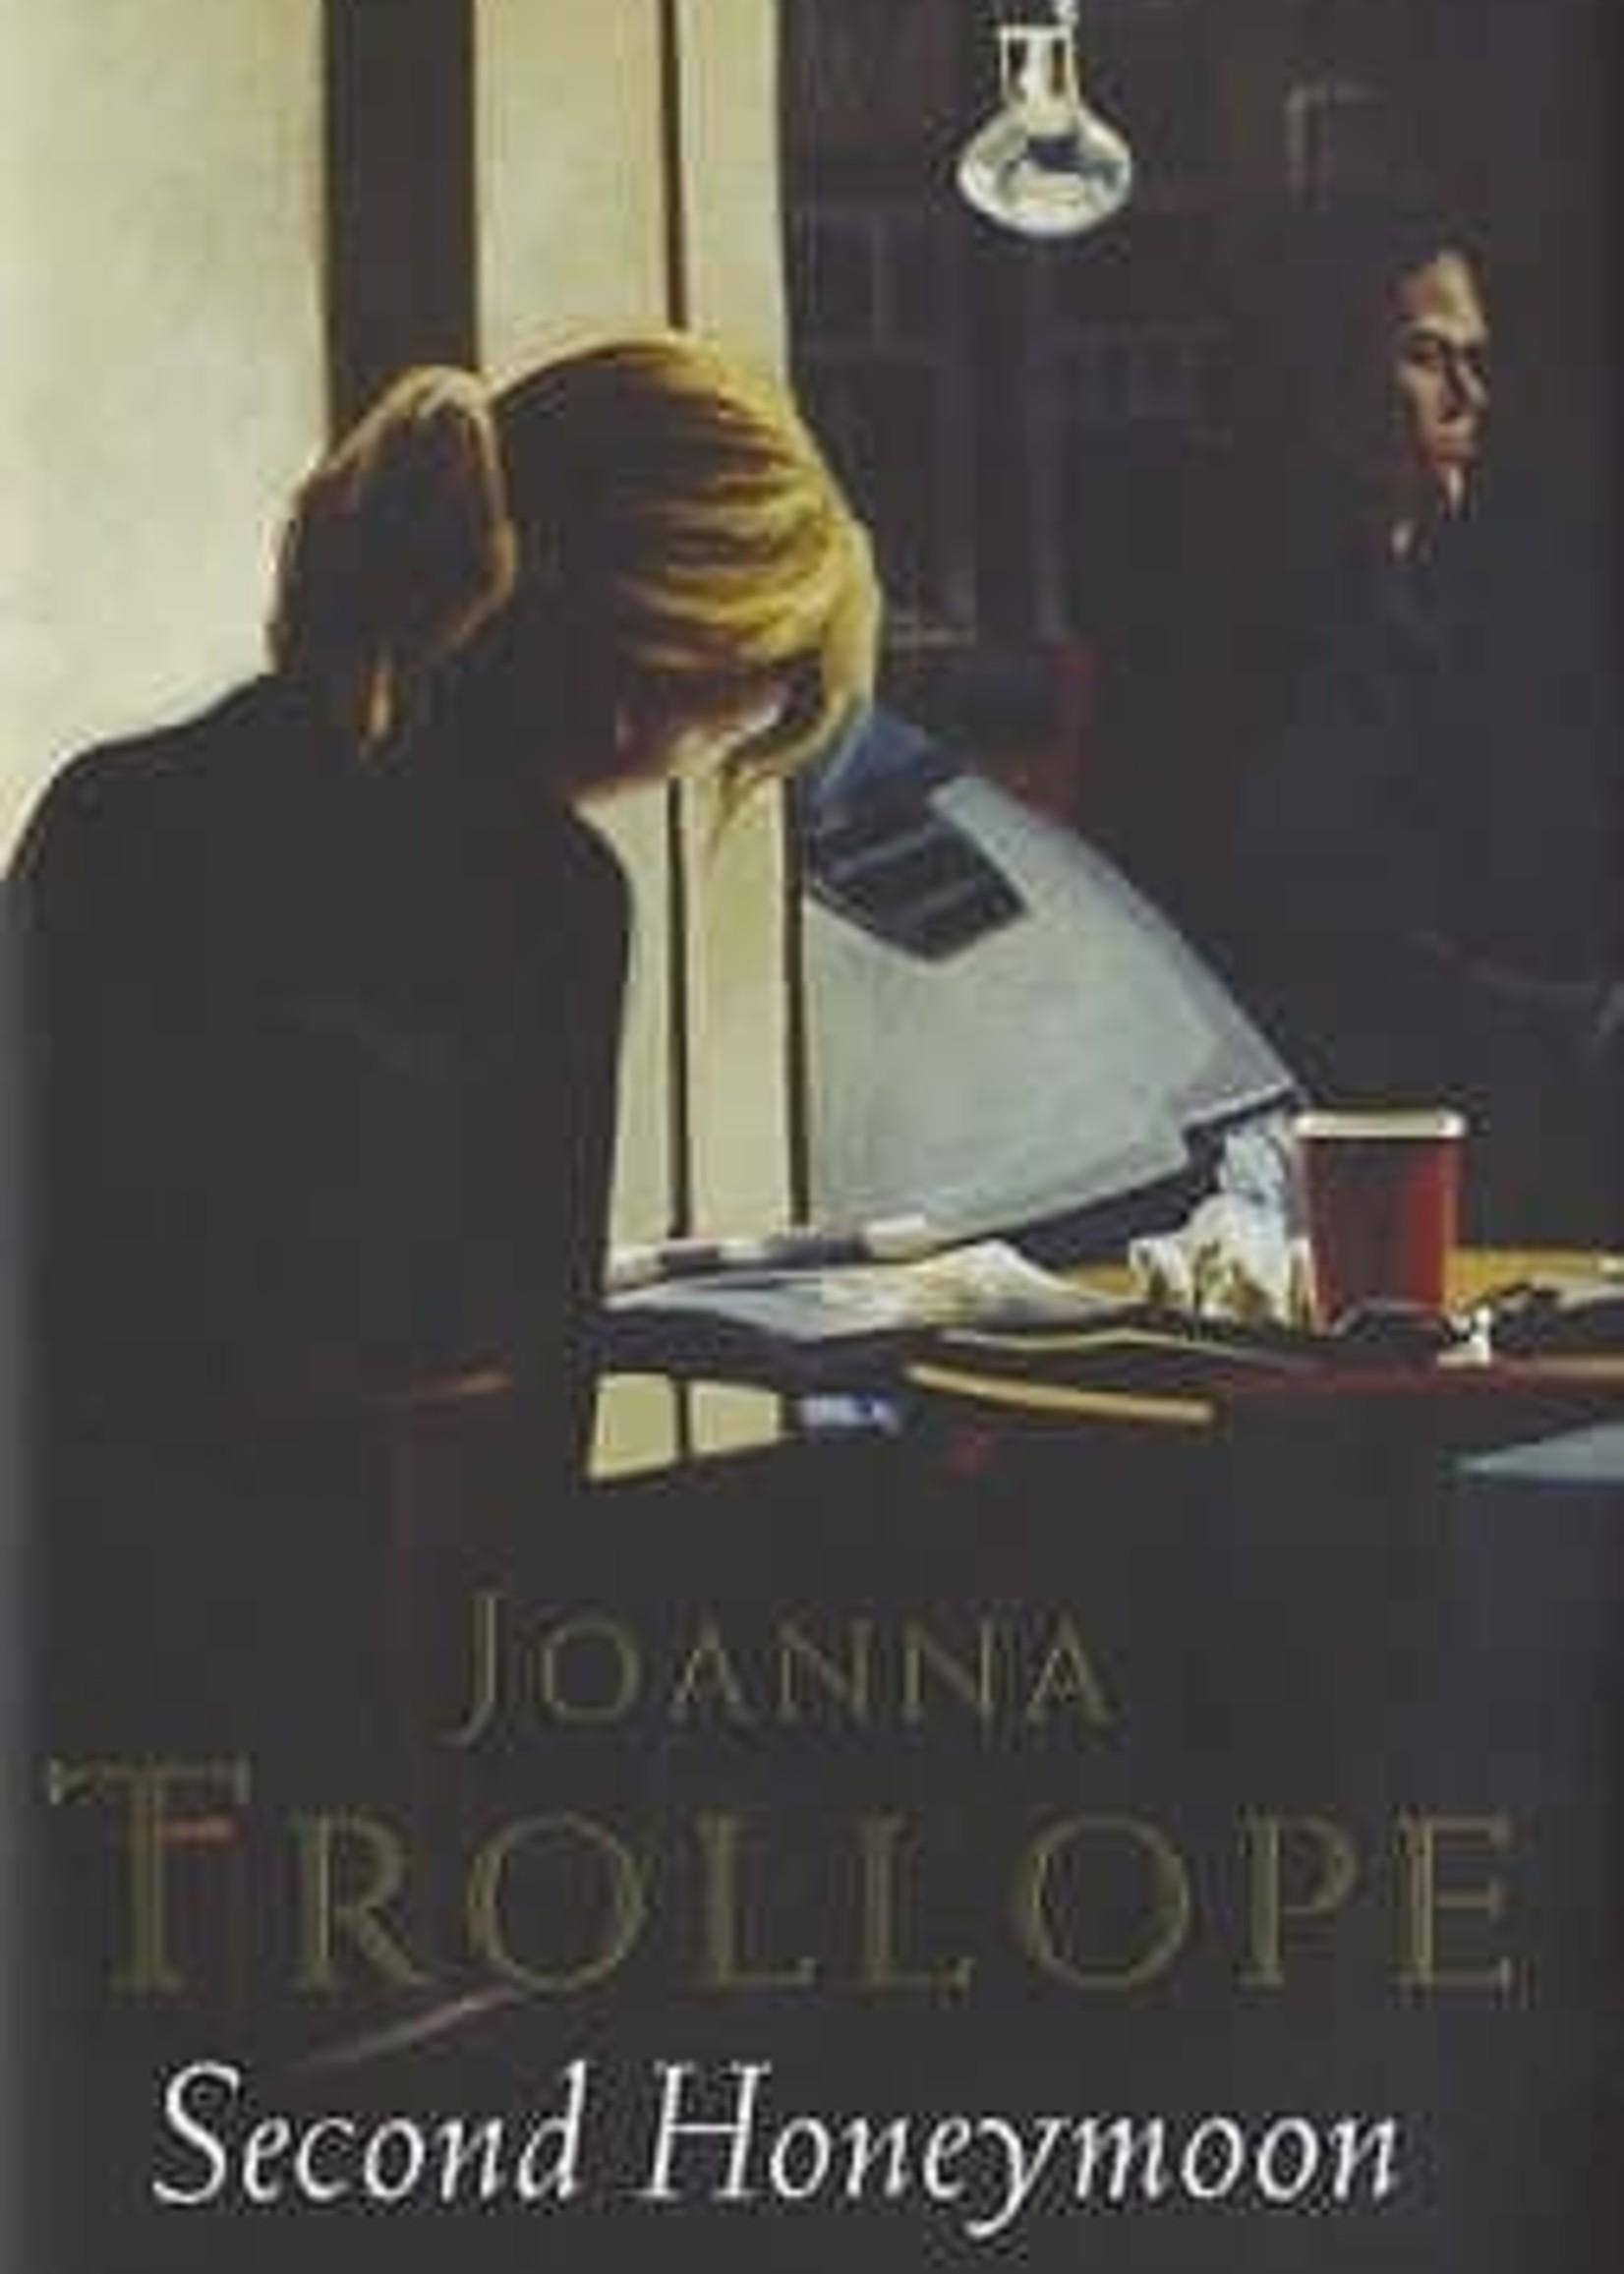 USED - Second Honeymoon by Joanna Trollope